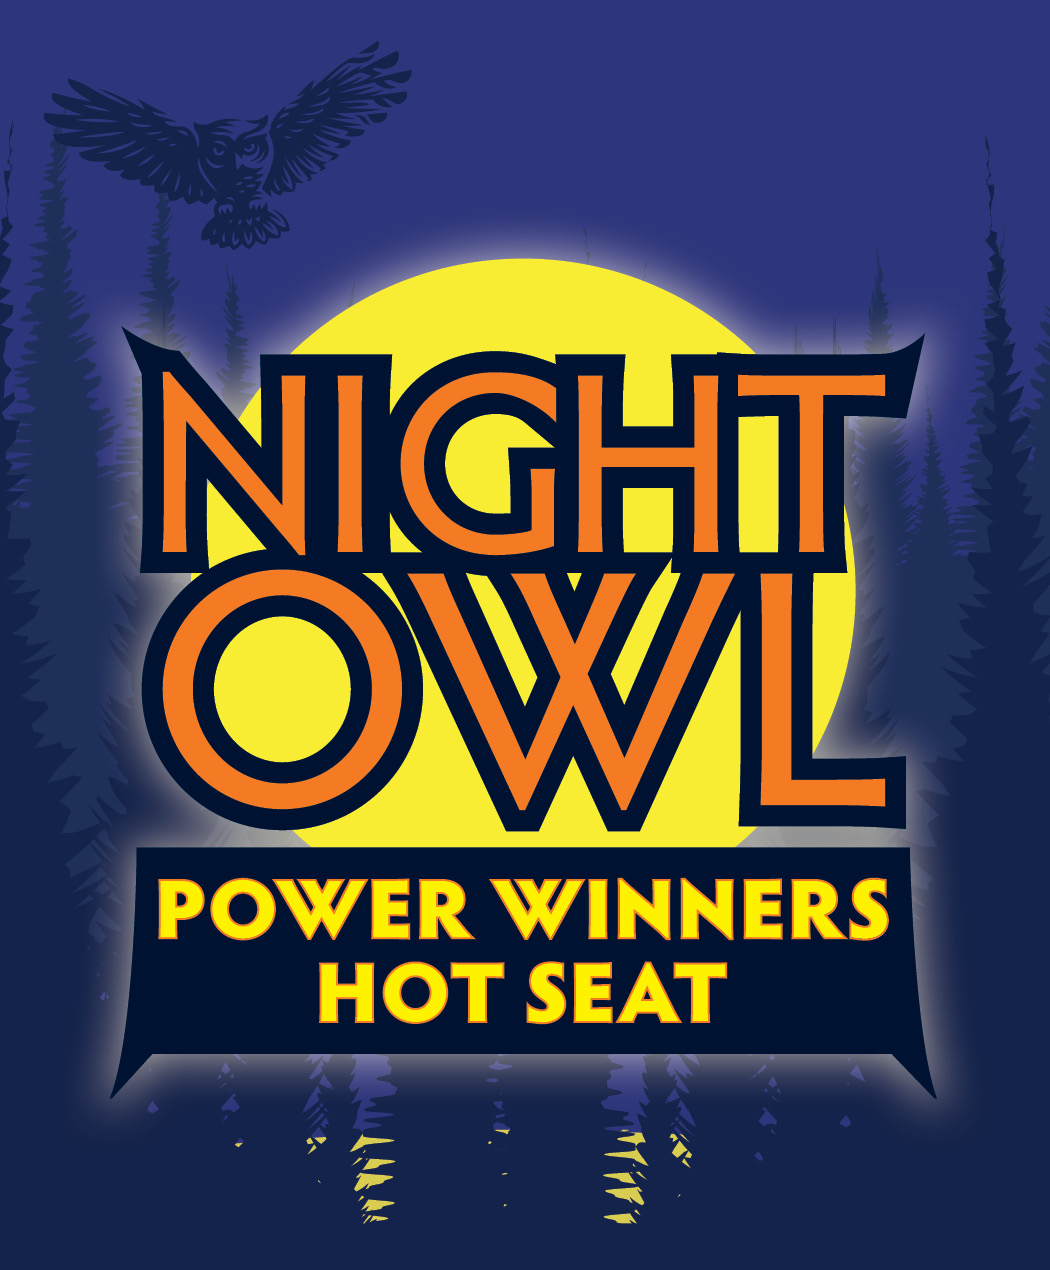 Night Owl Power Winners Hot Seat